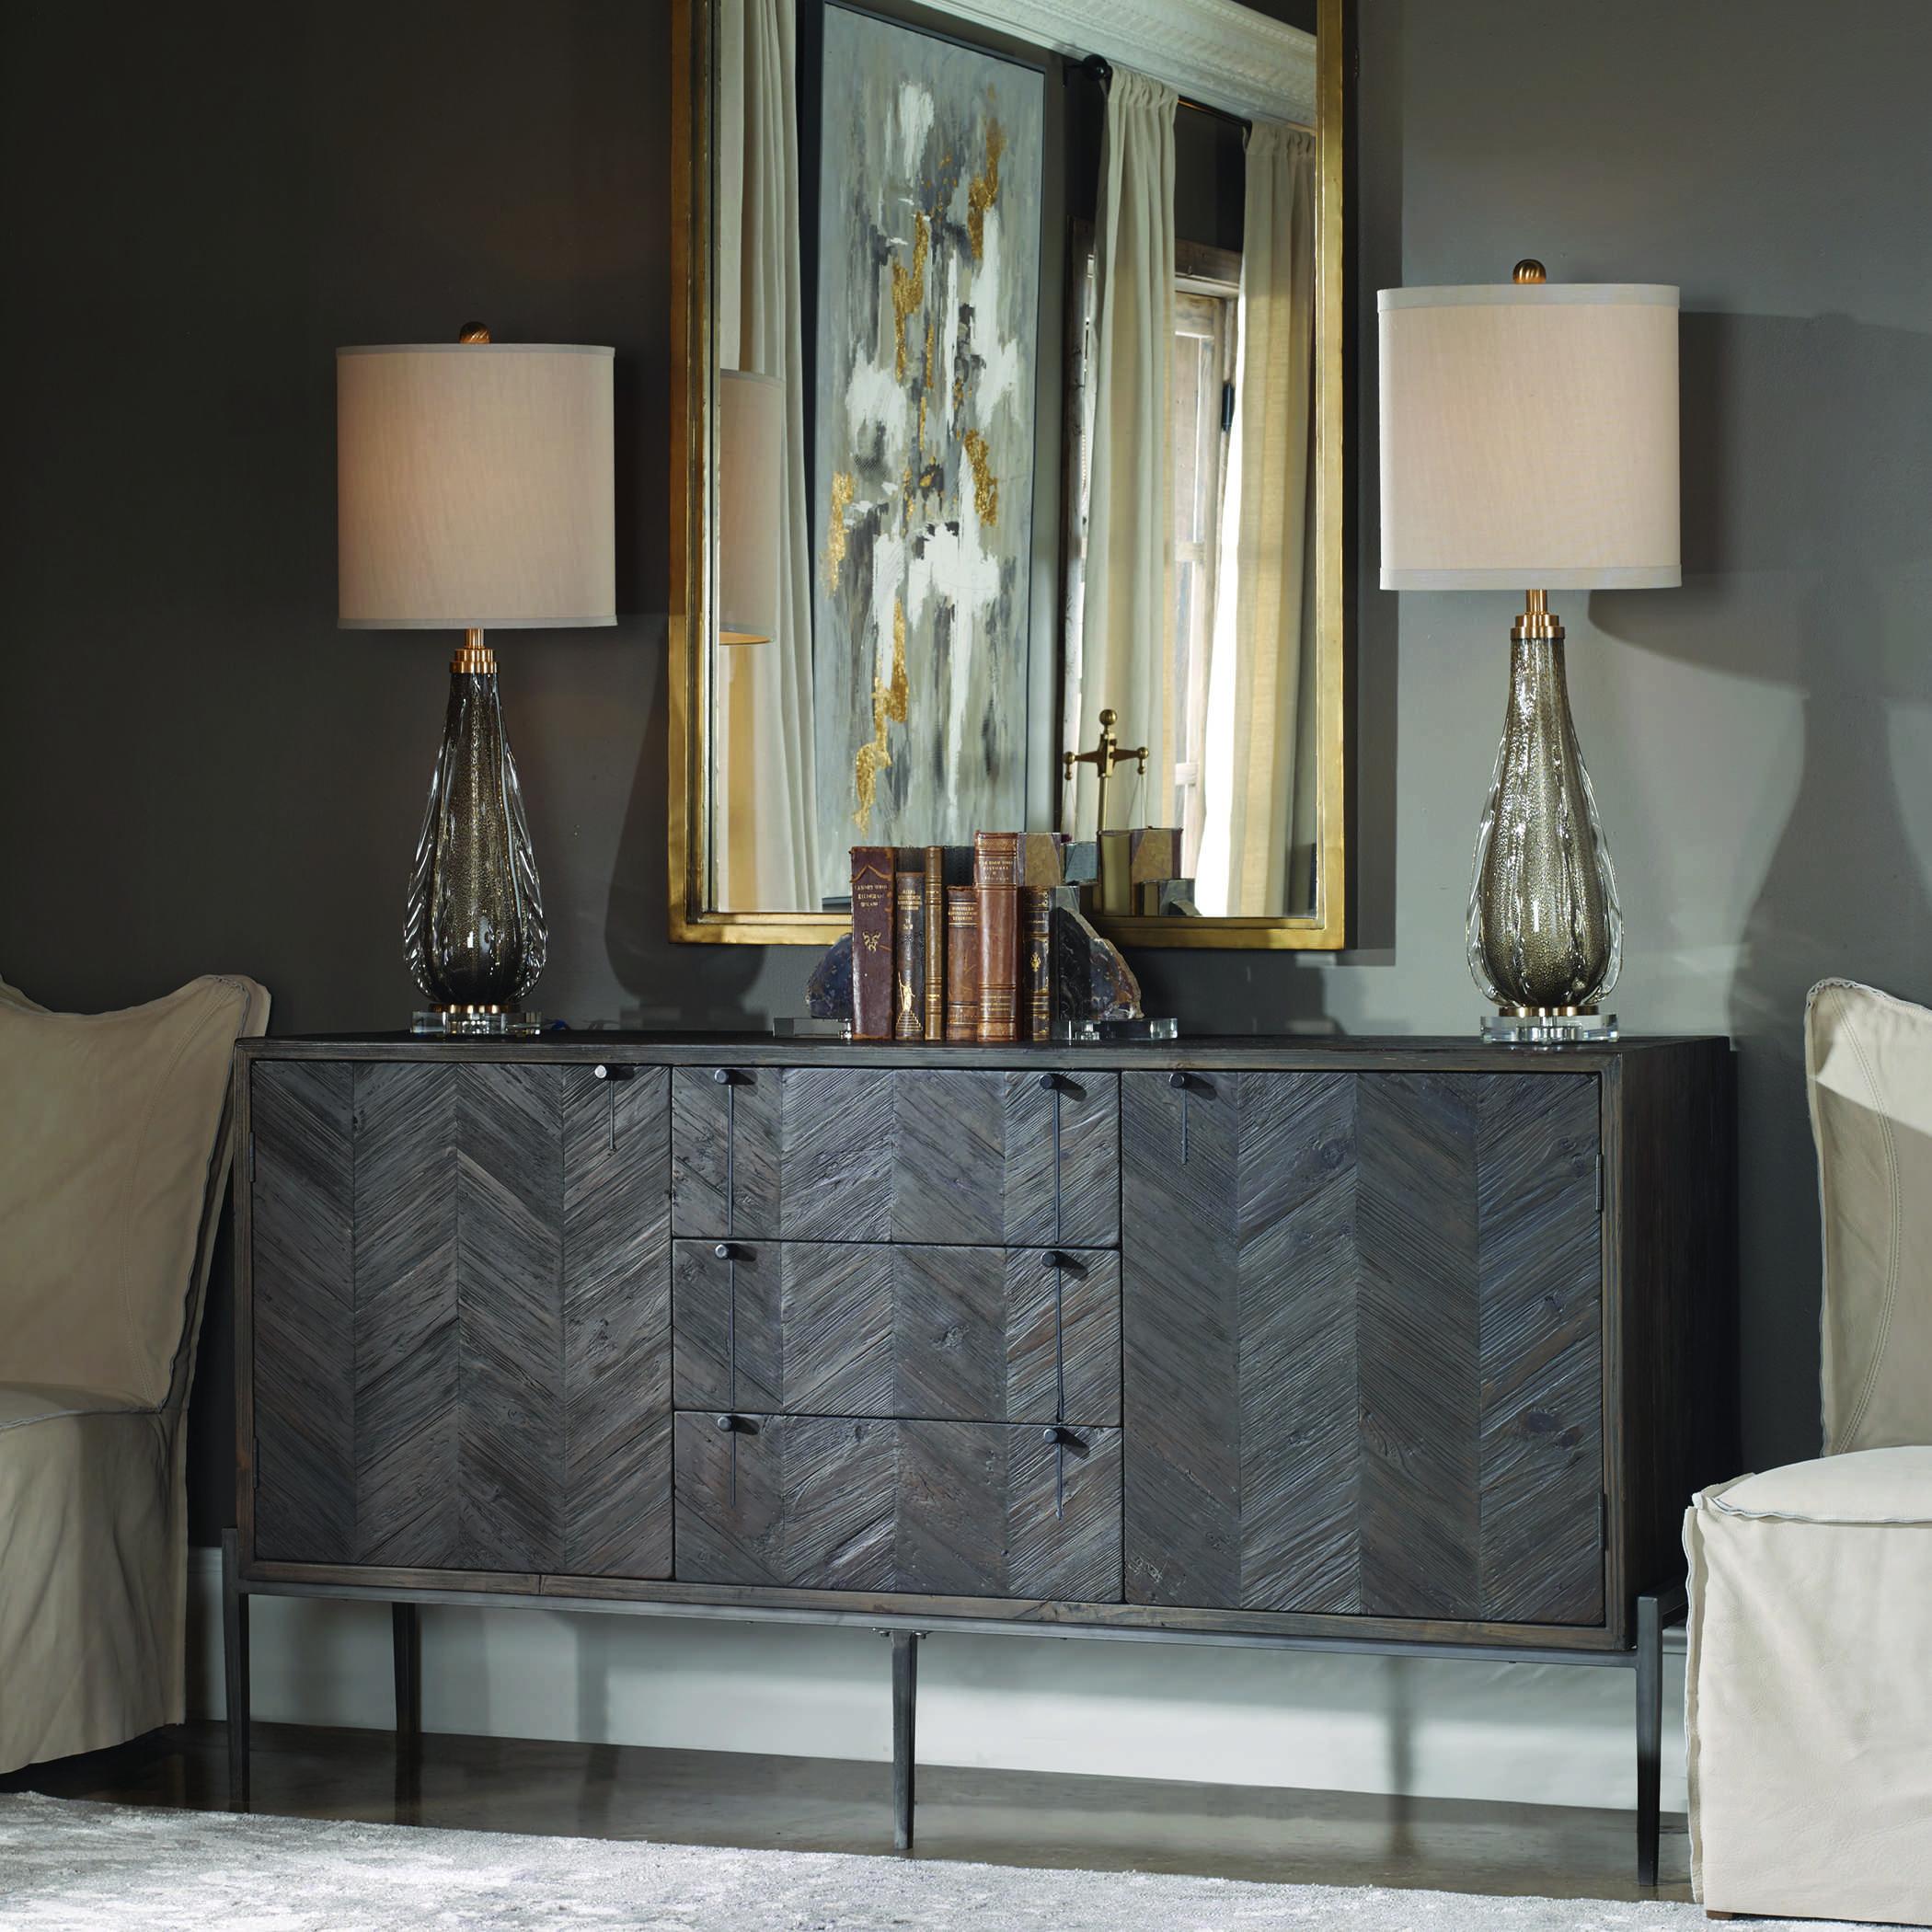 Uttermost Accent Furniture Mirrors Wall Decor Clocks Lamps Art